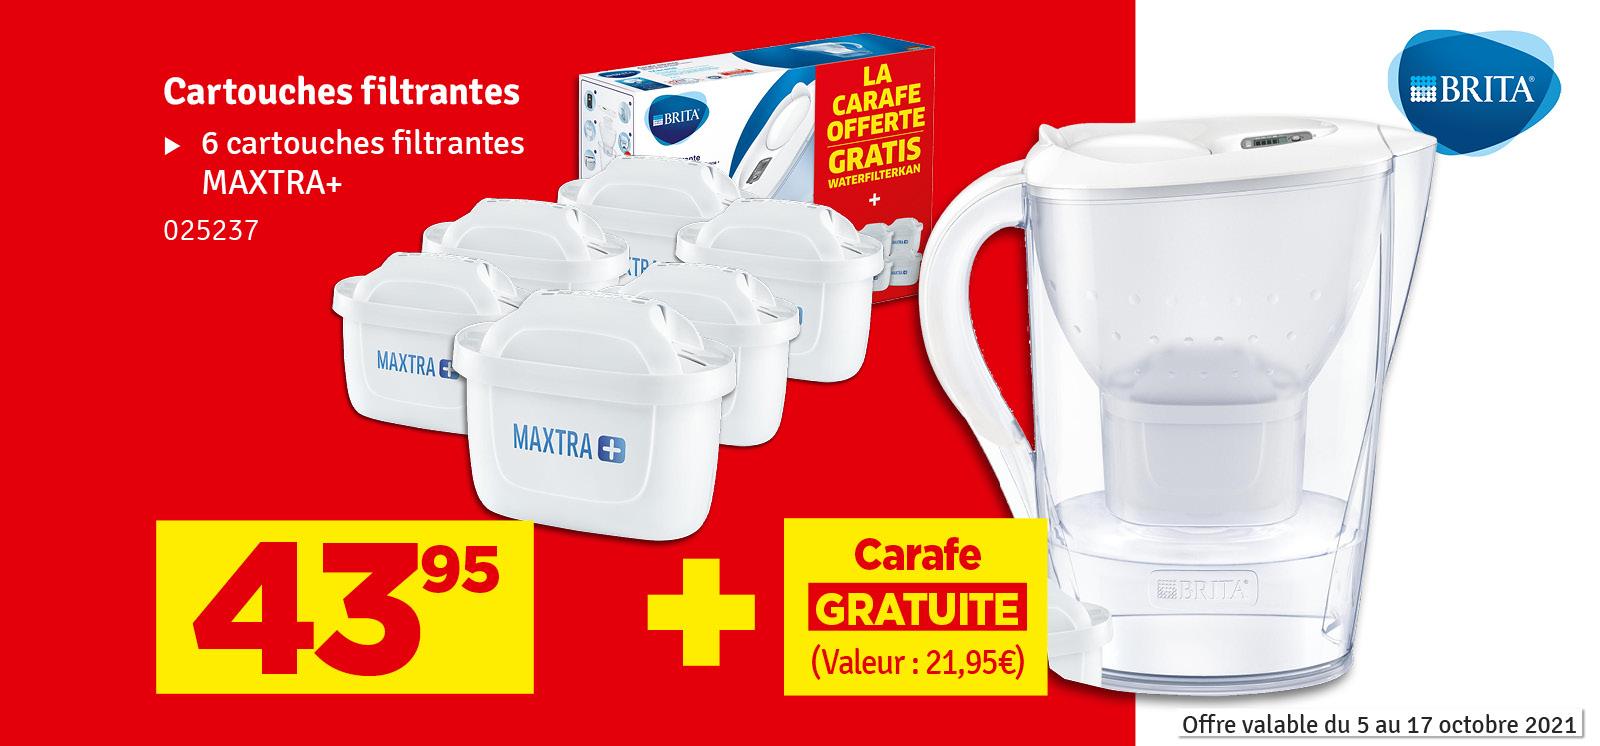 Promo - Cartouche filtrante Maxtra+ 6 pièces avec carafe BRITA